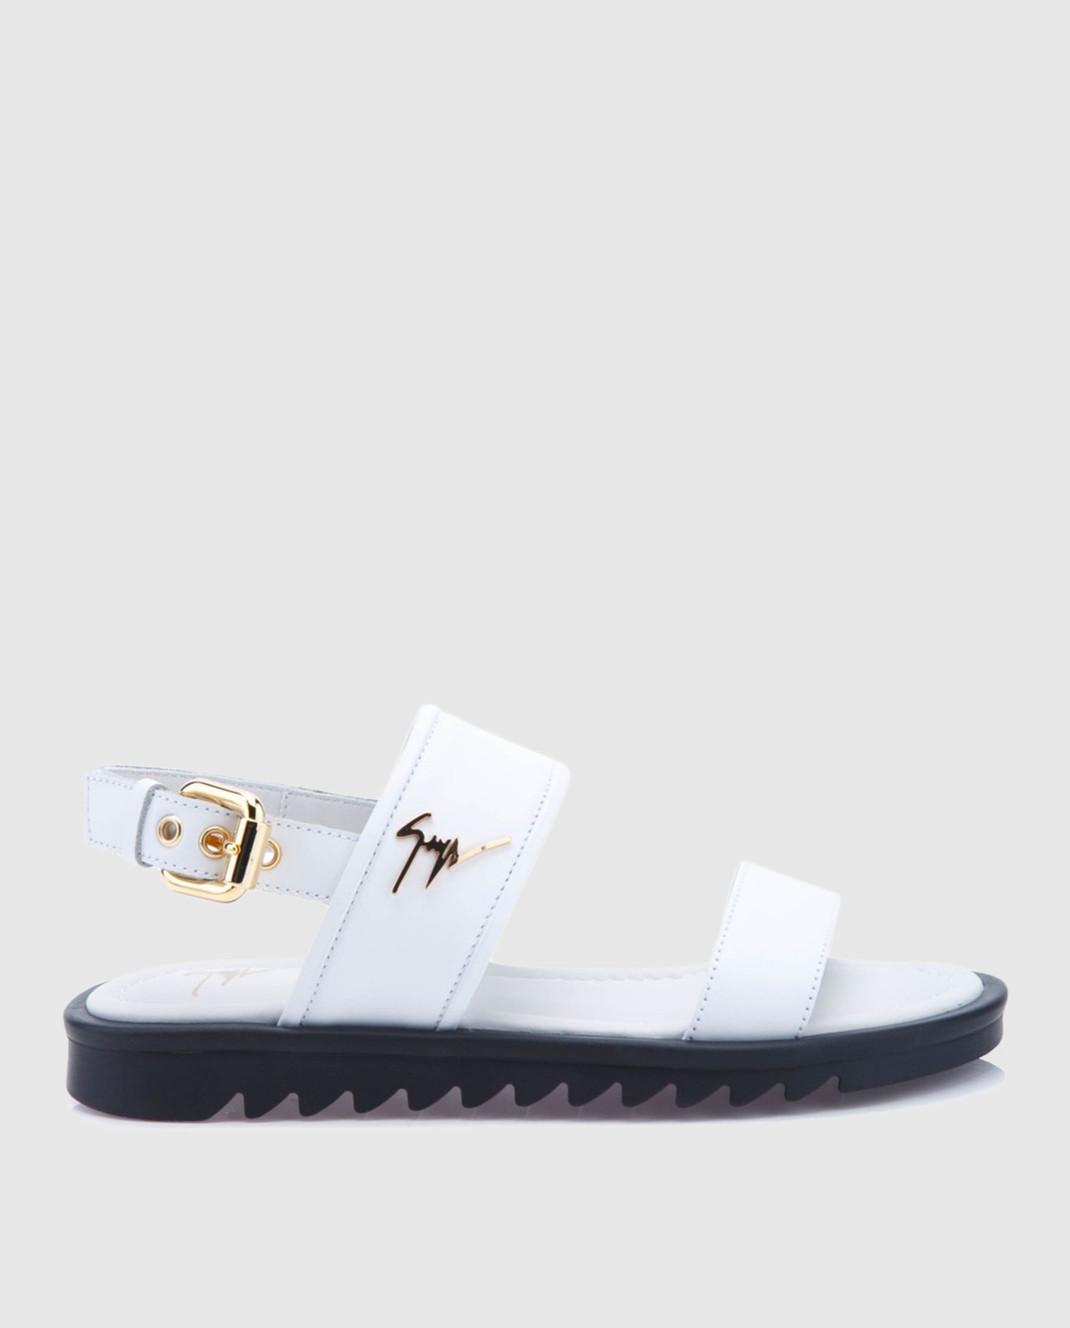 Giuseppe Zanotti Белые кожаные сандалии  SBE8409002